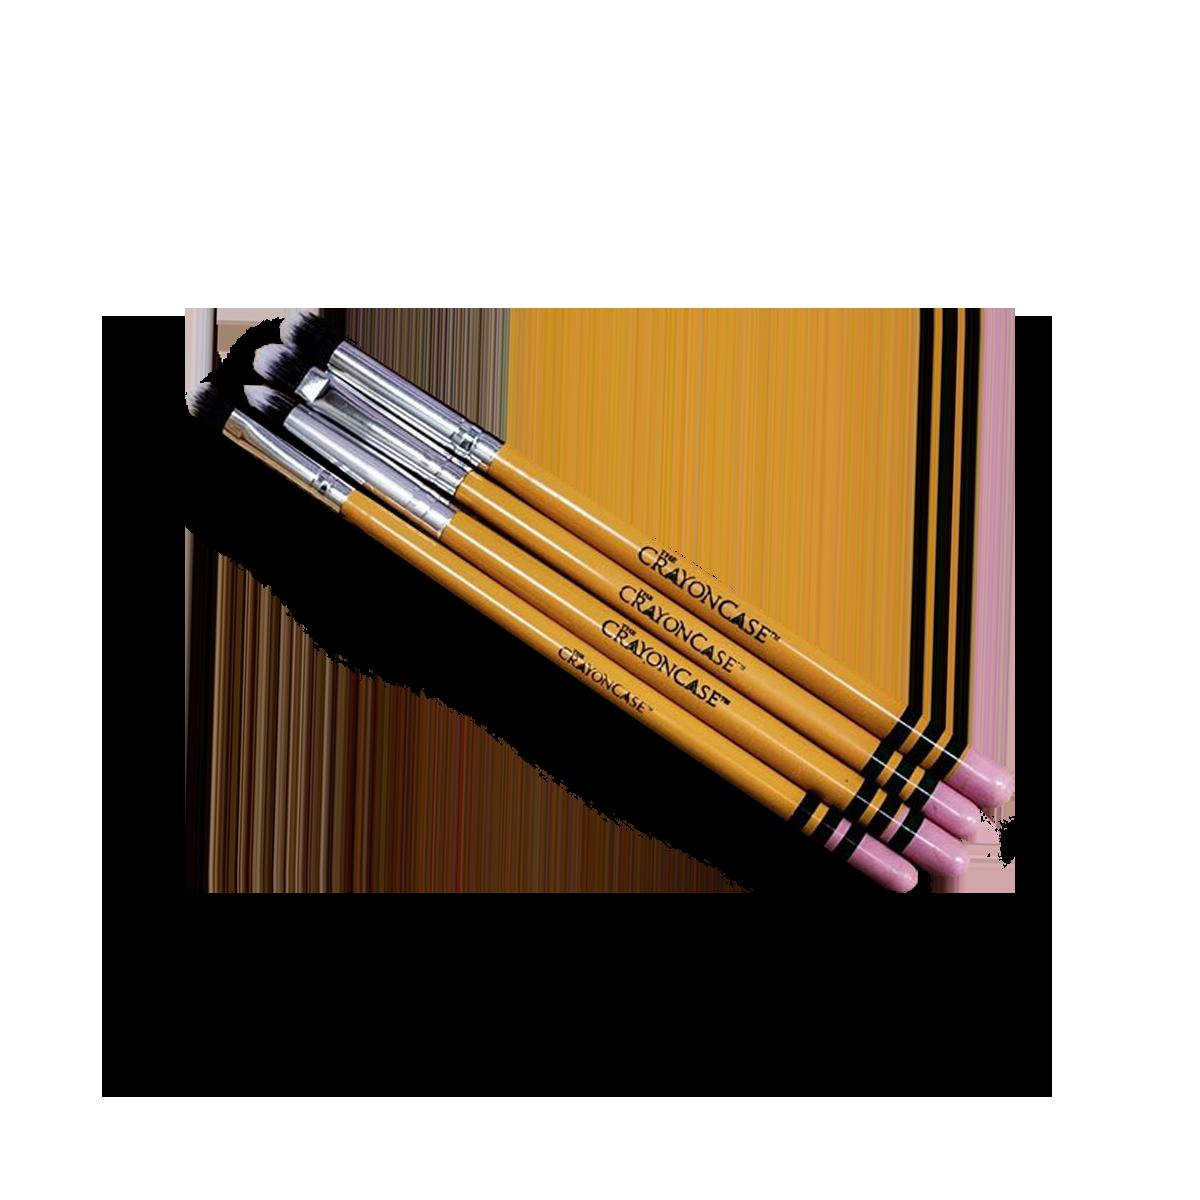 7PC iShadow Pencil Brush Set It cosmetics brushes, Bh